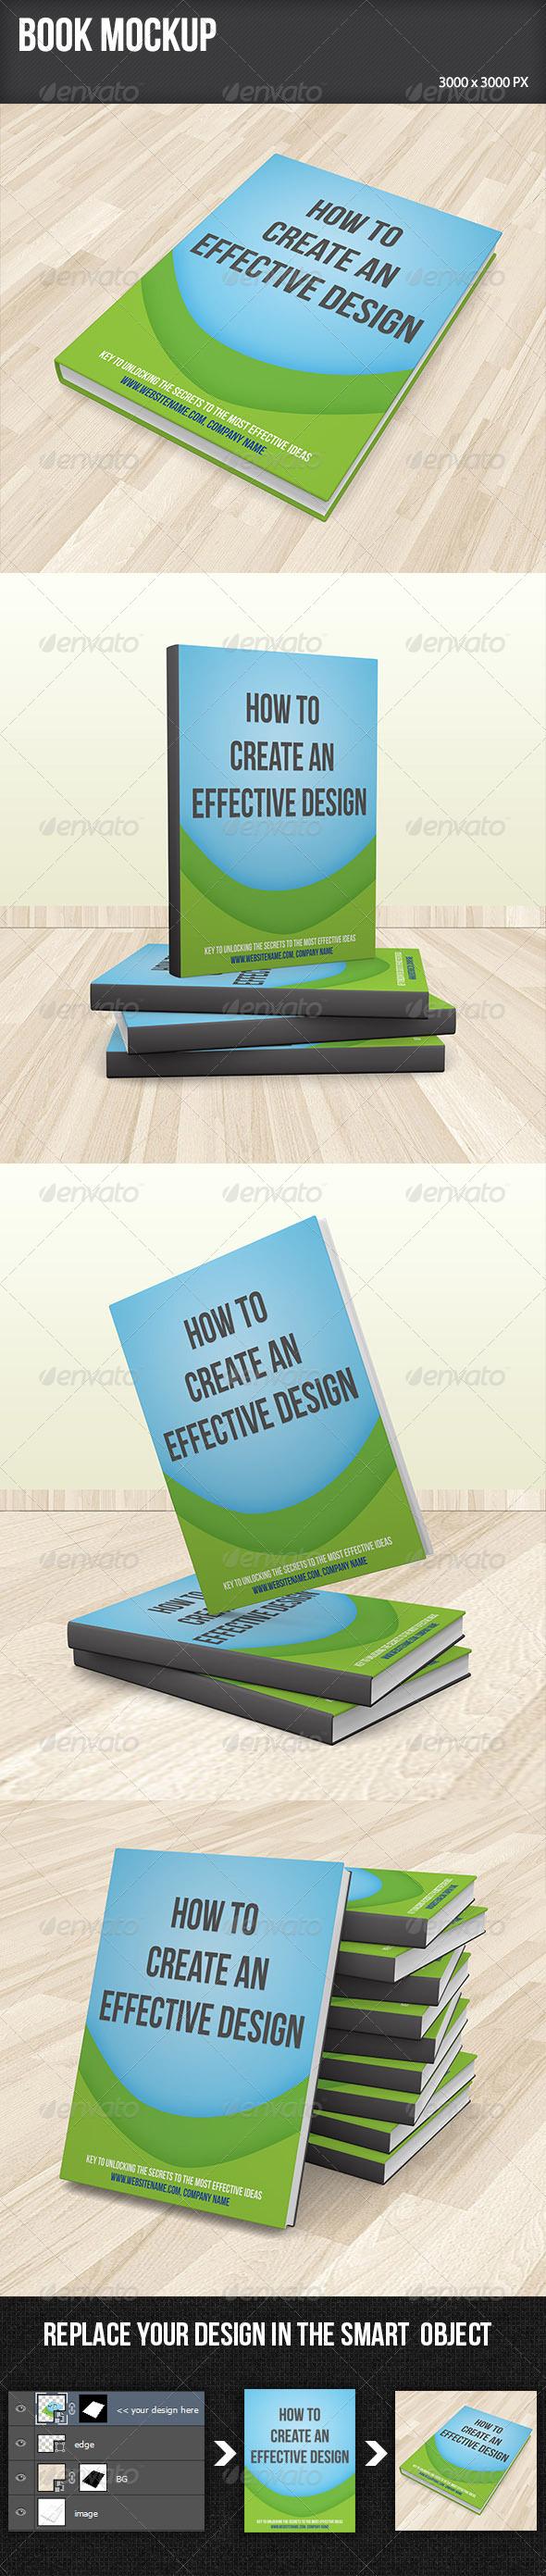 GraphicRiver Book Mockup 5900584